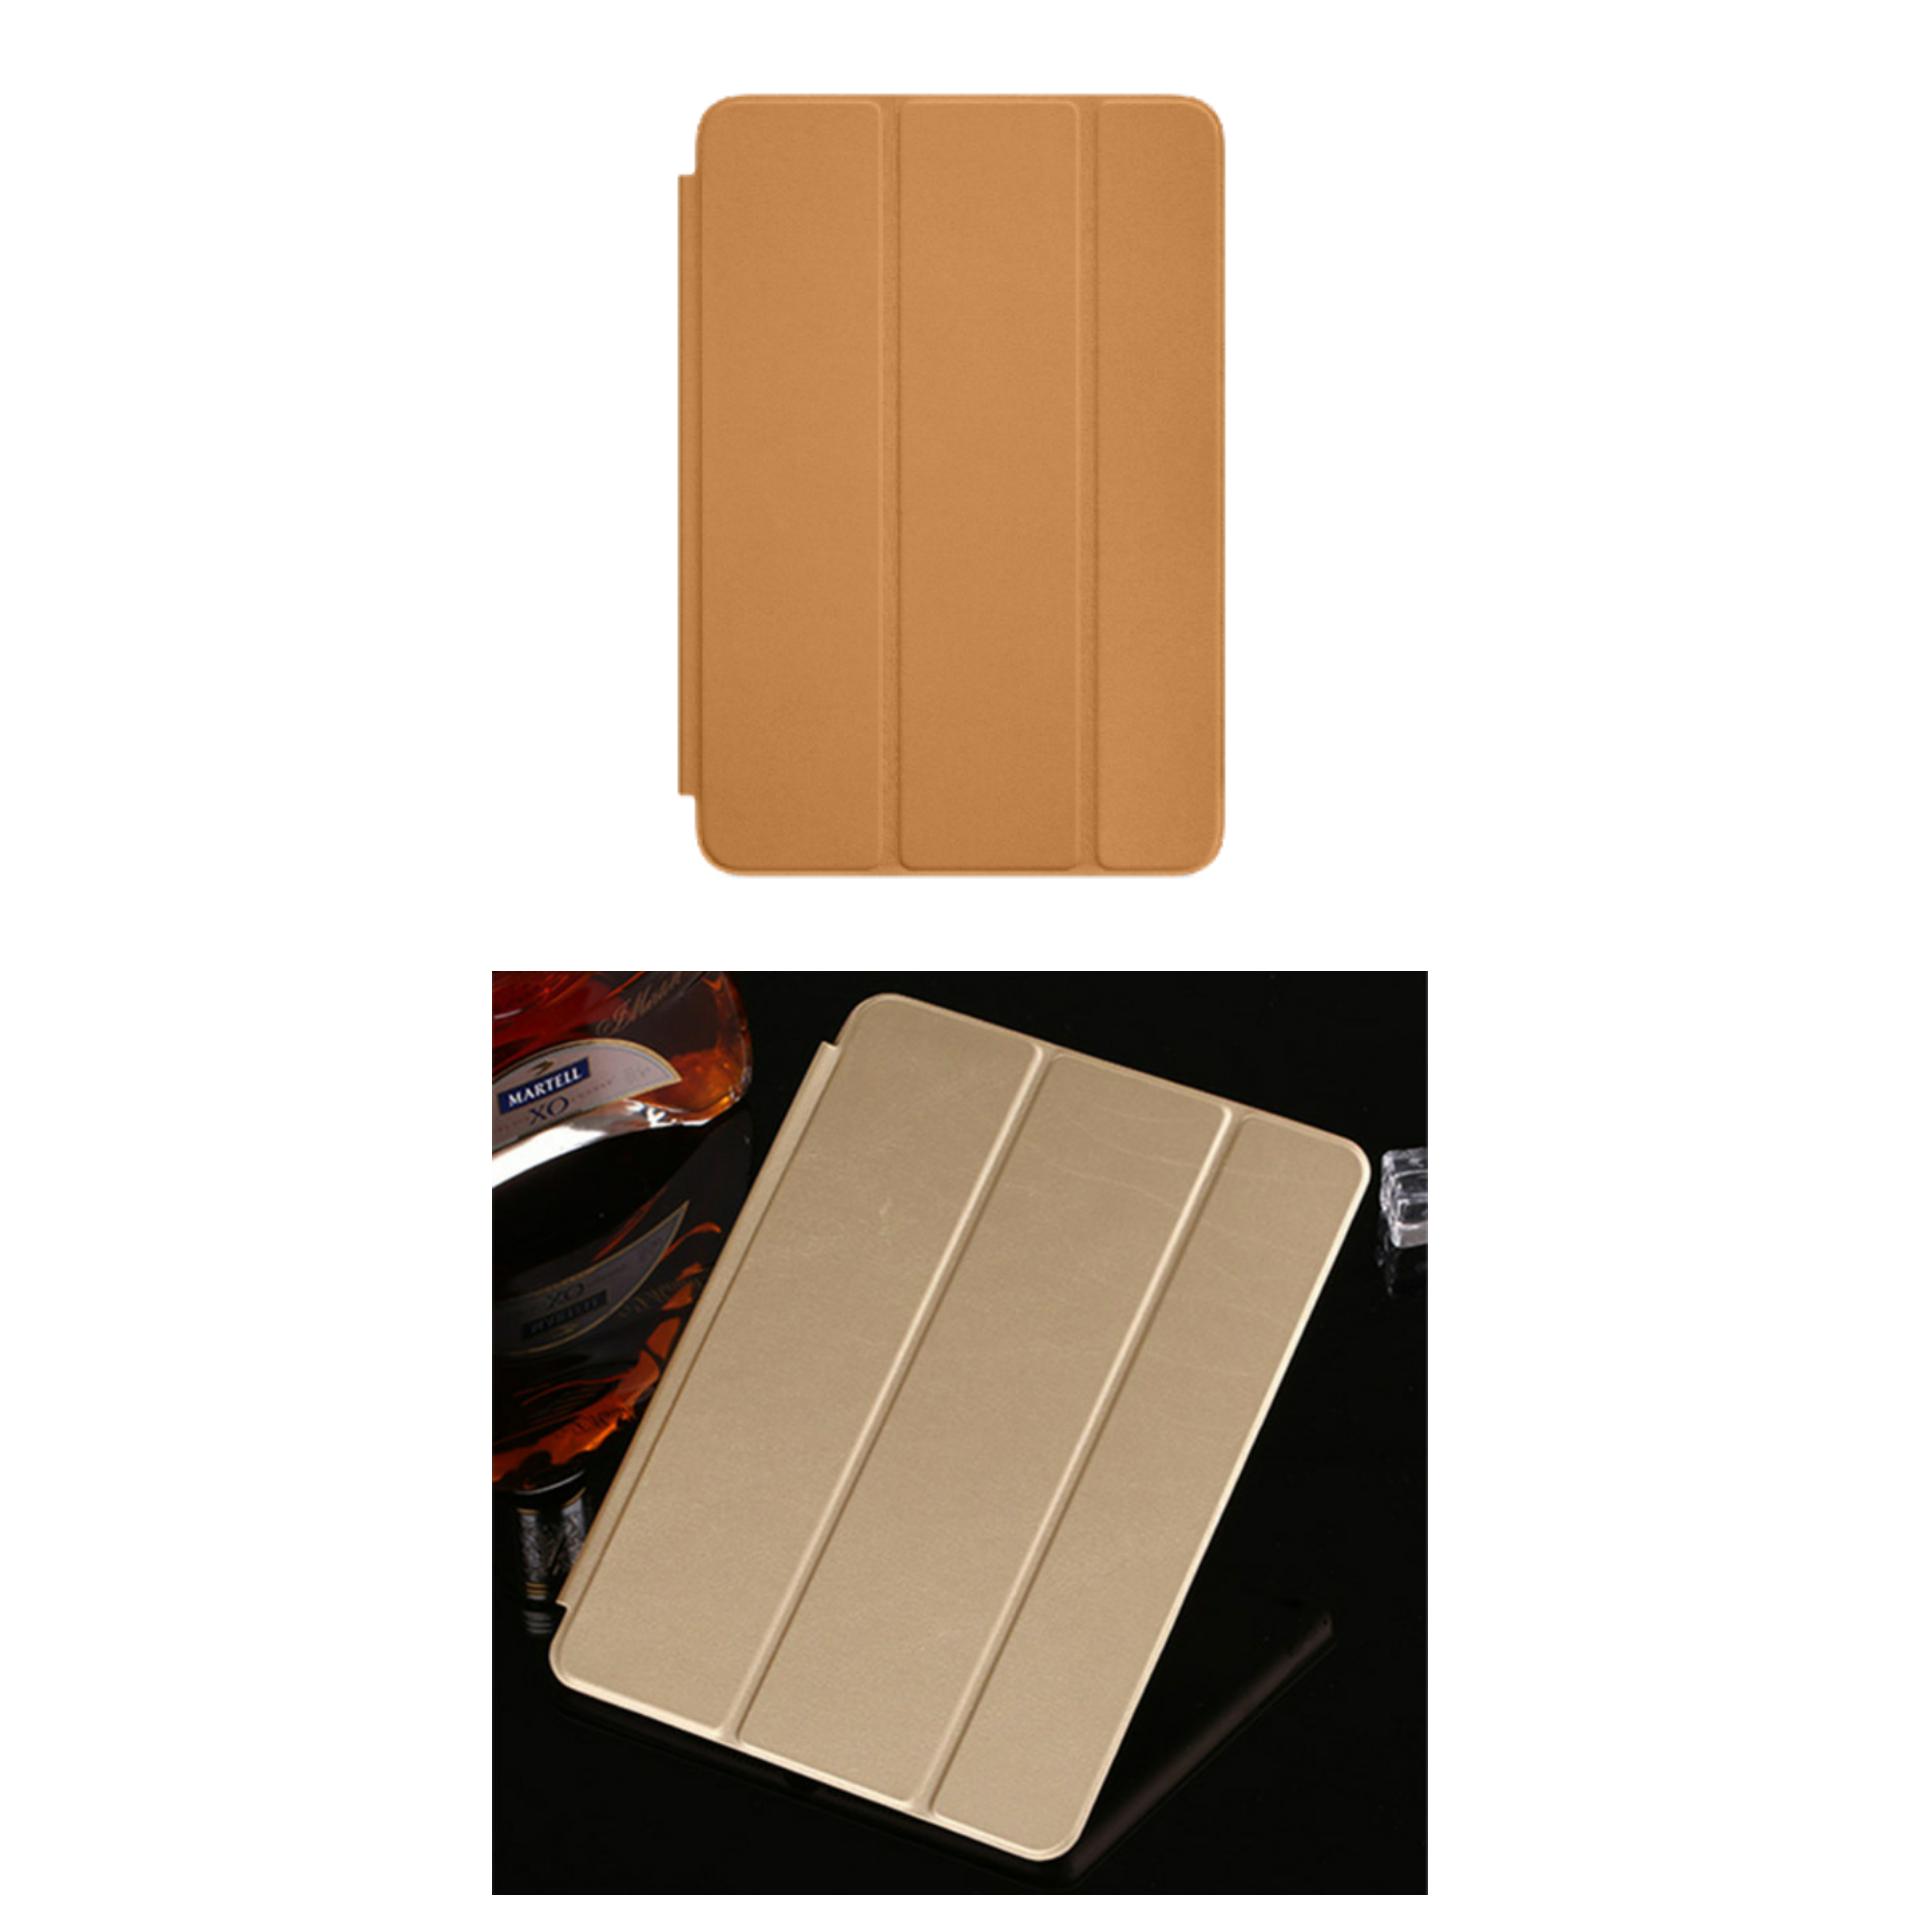 jual smart cover ipad mini 4 case leather original. Black Bedroom Furniture Sets. Home Design Ideas